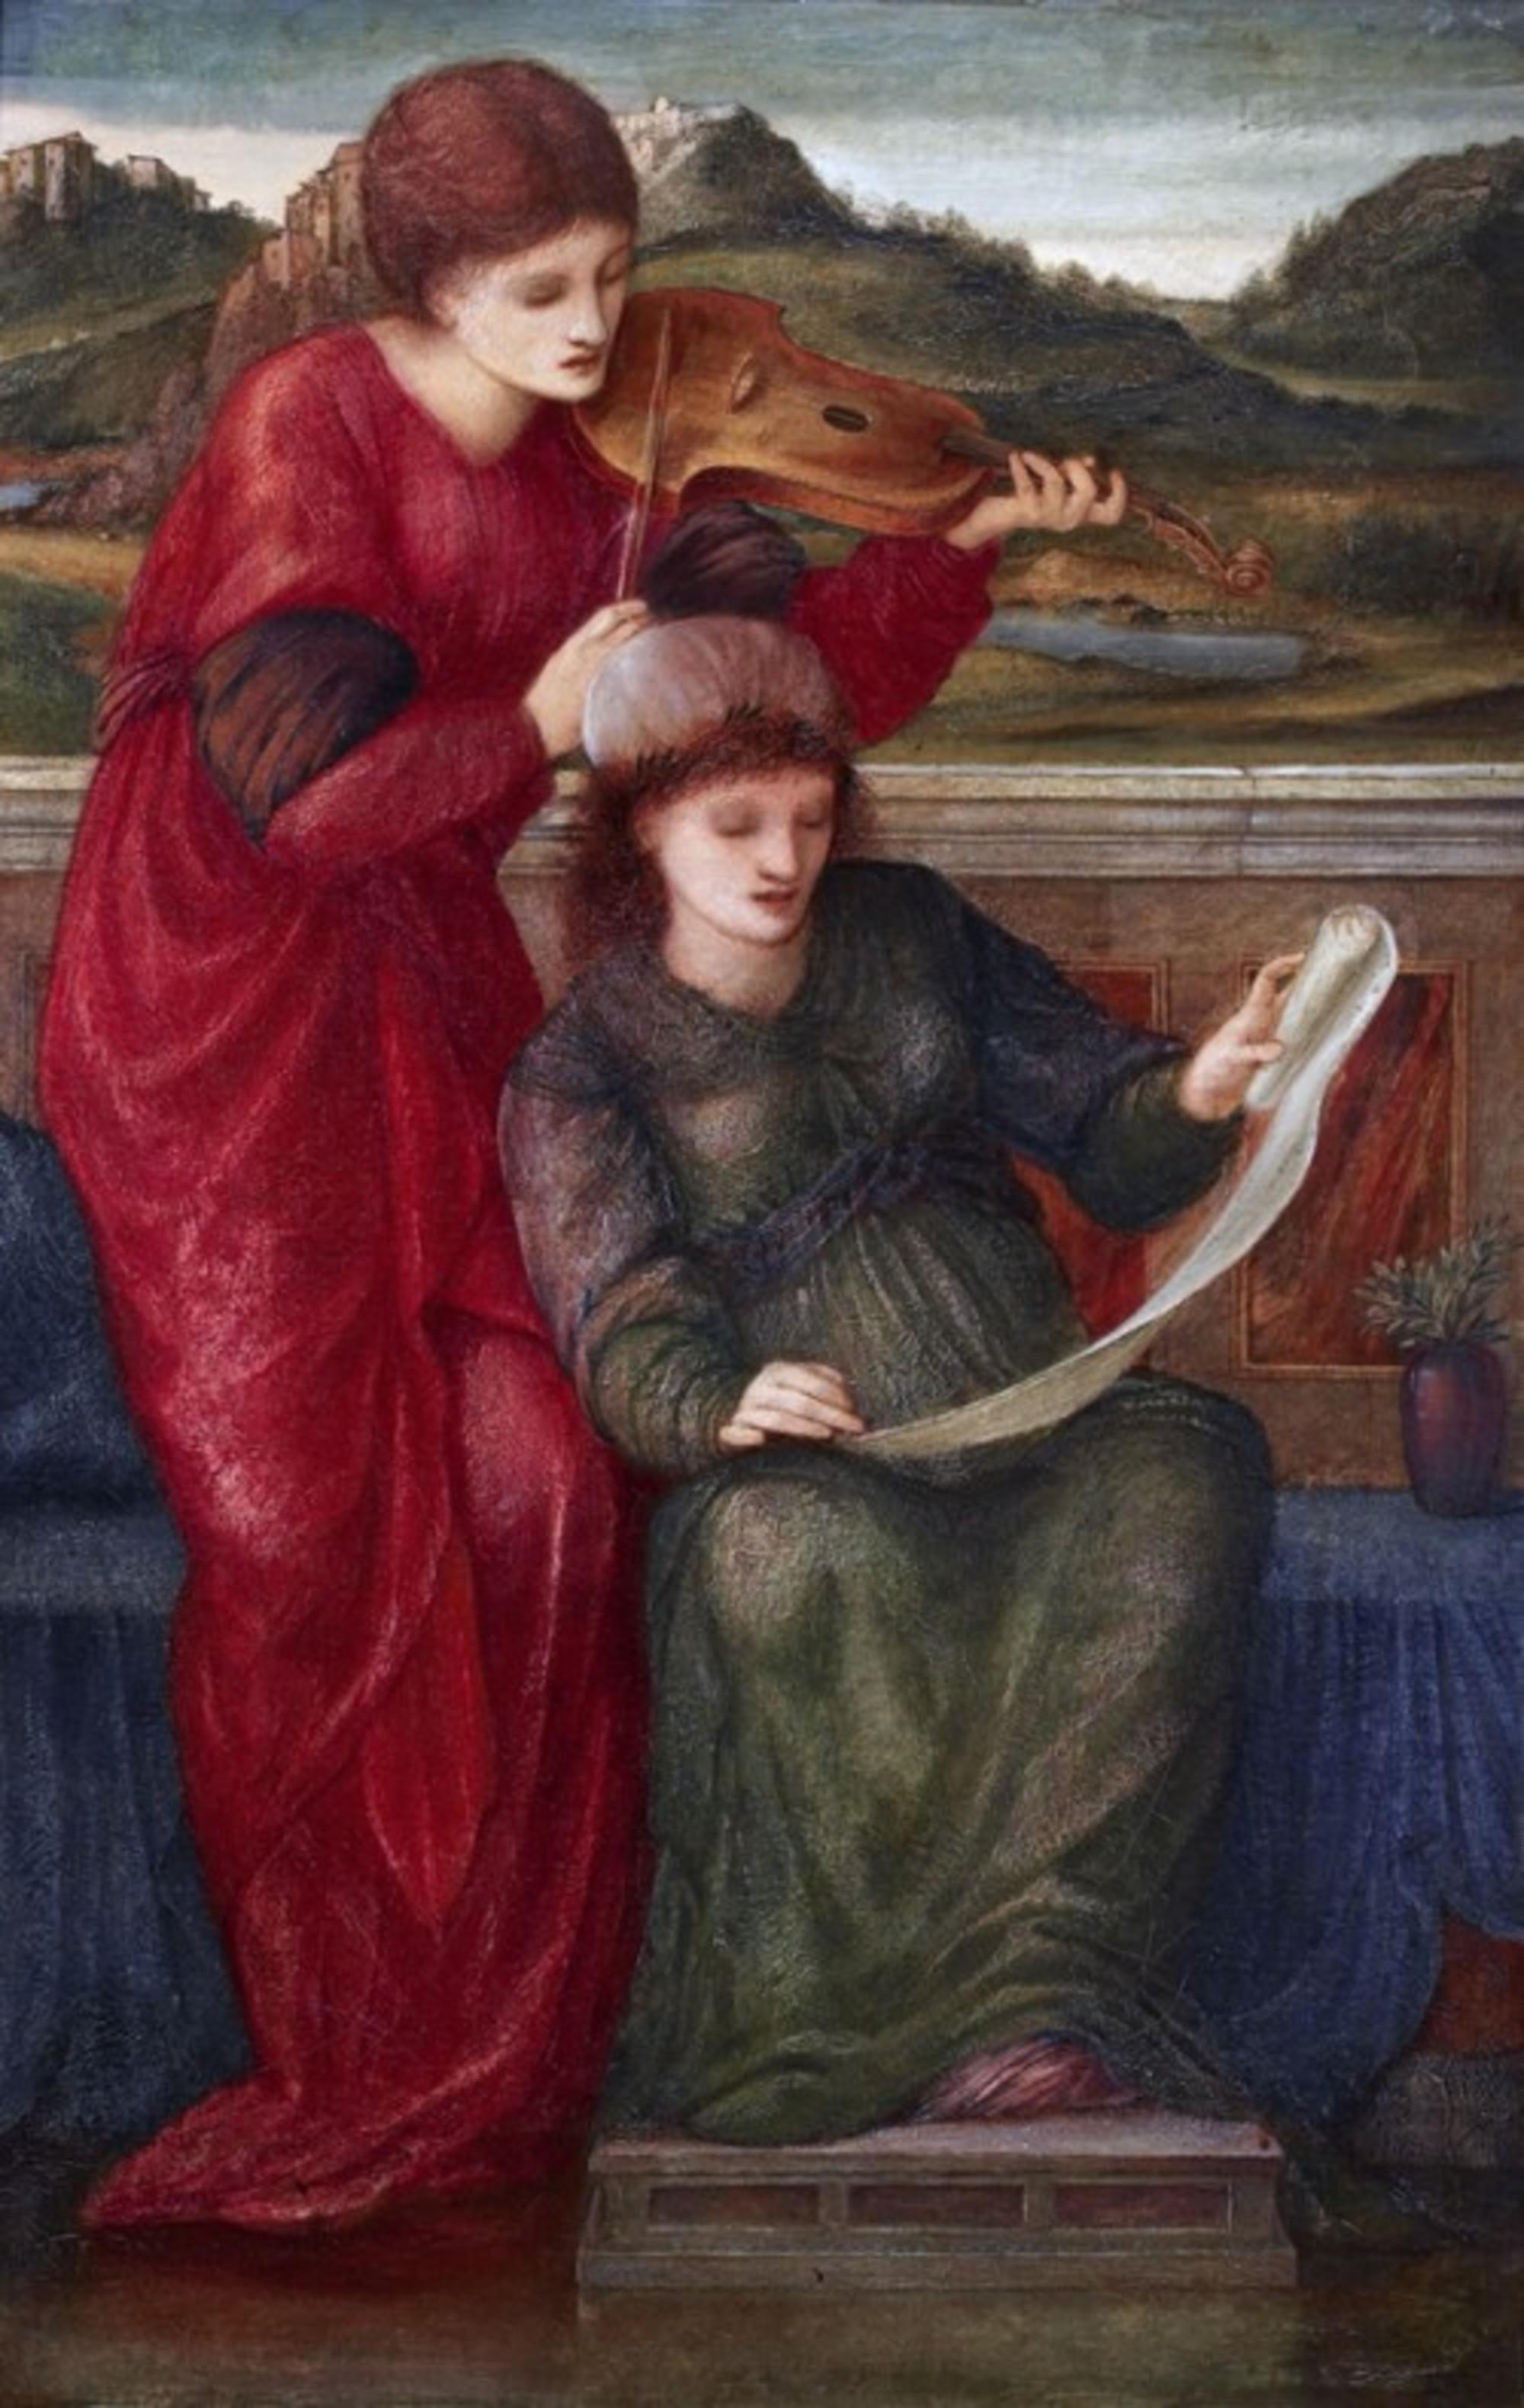 Edward-Burne-Jones-Music-1877.-Oil-on-canvas.jpg